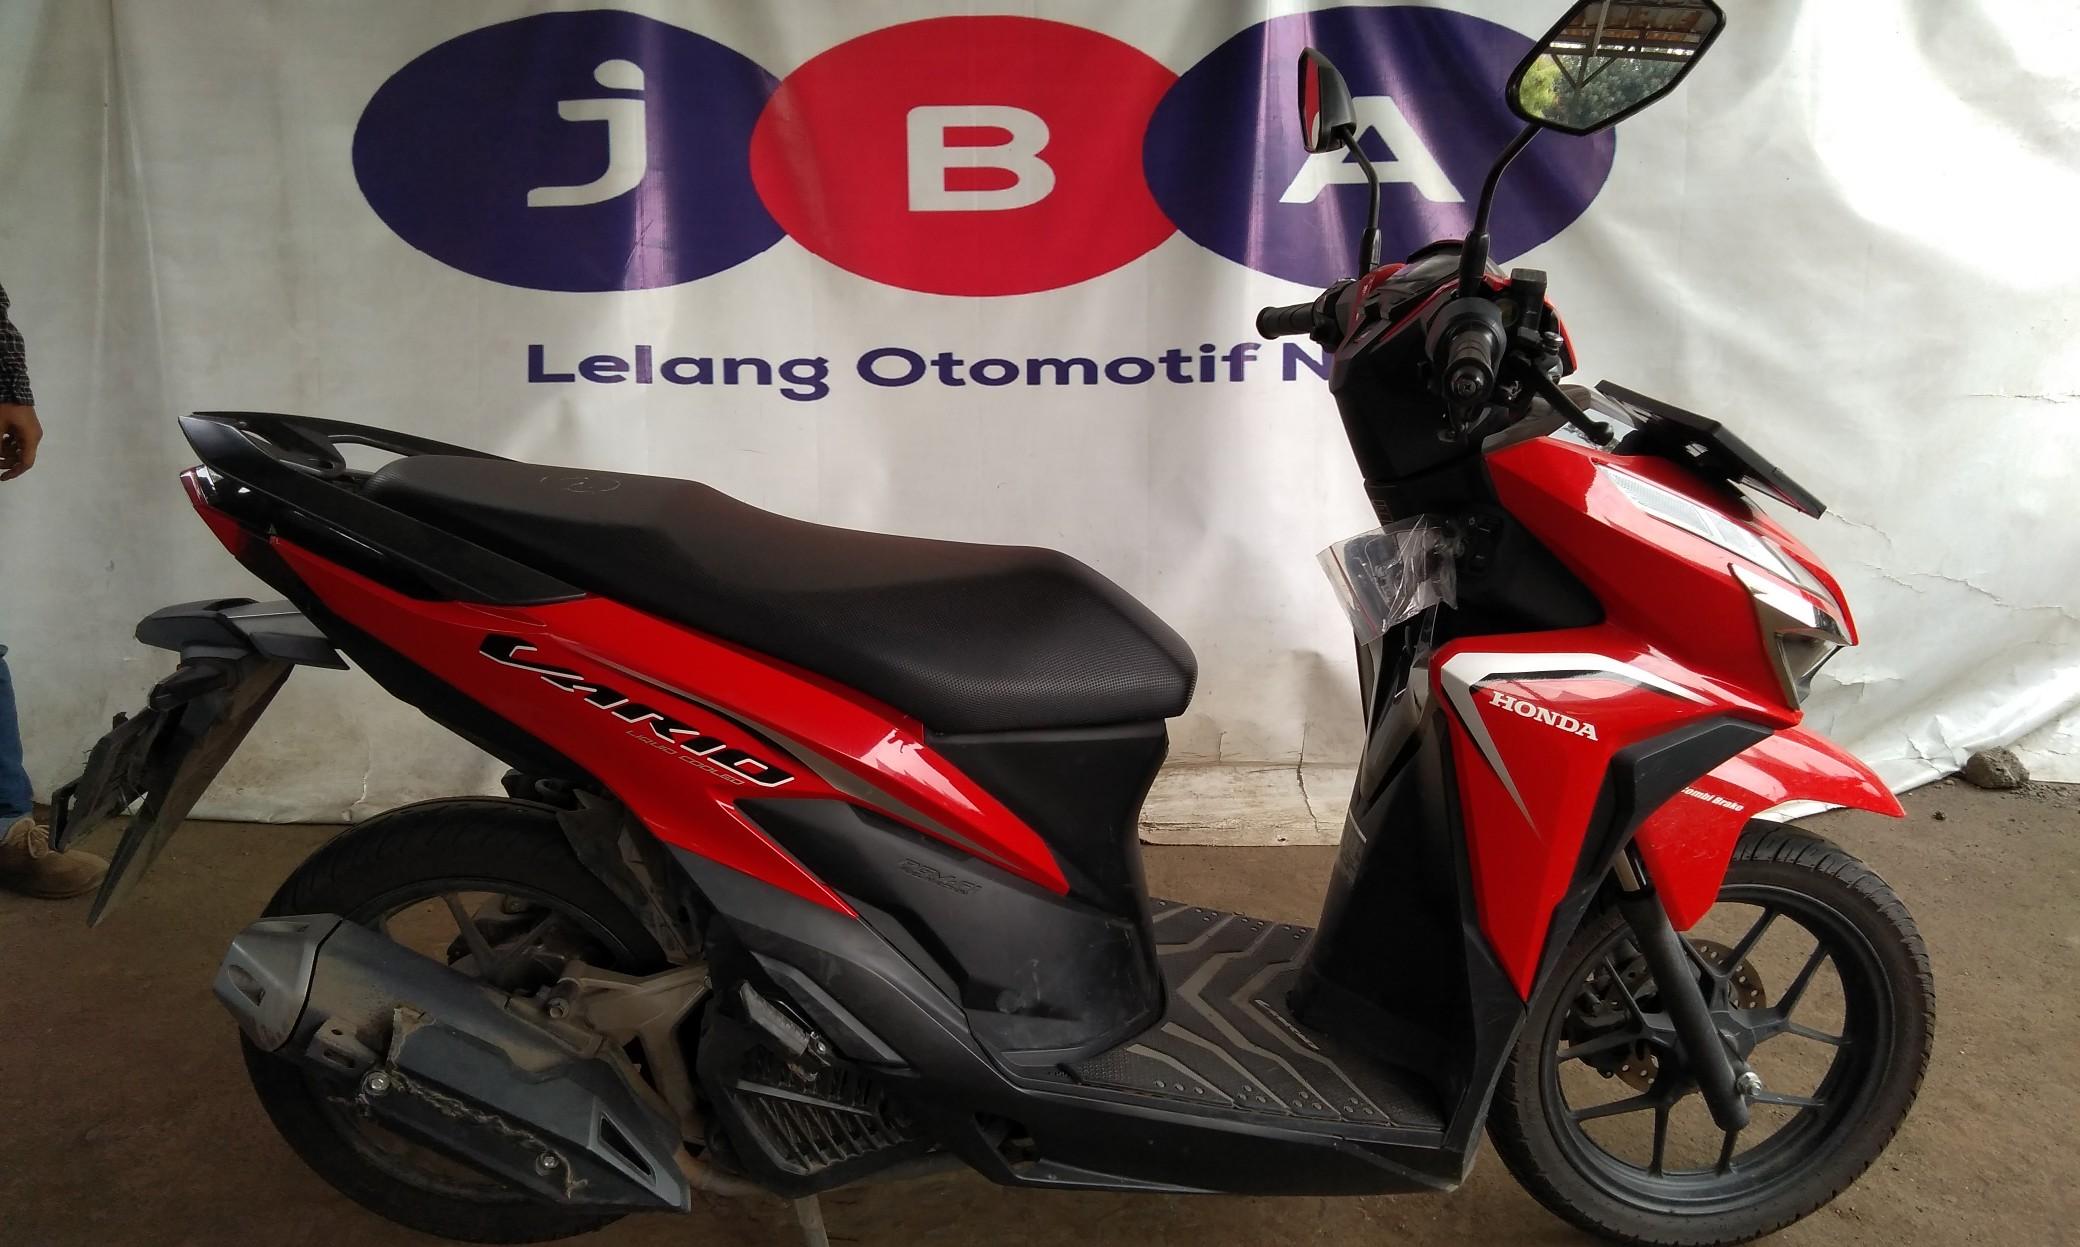 honda vario 125 esp cbs bike detail auction pt jba indonesia jba